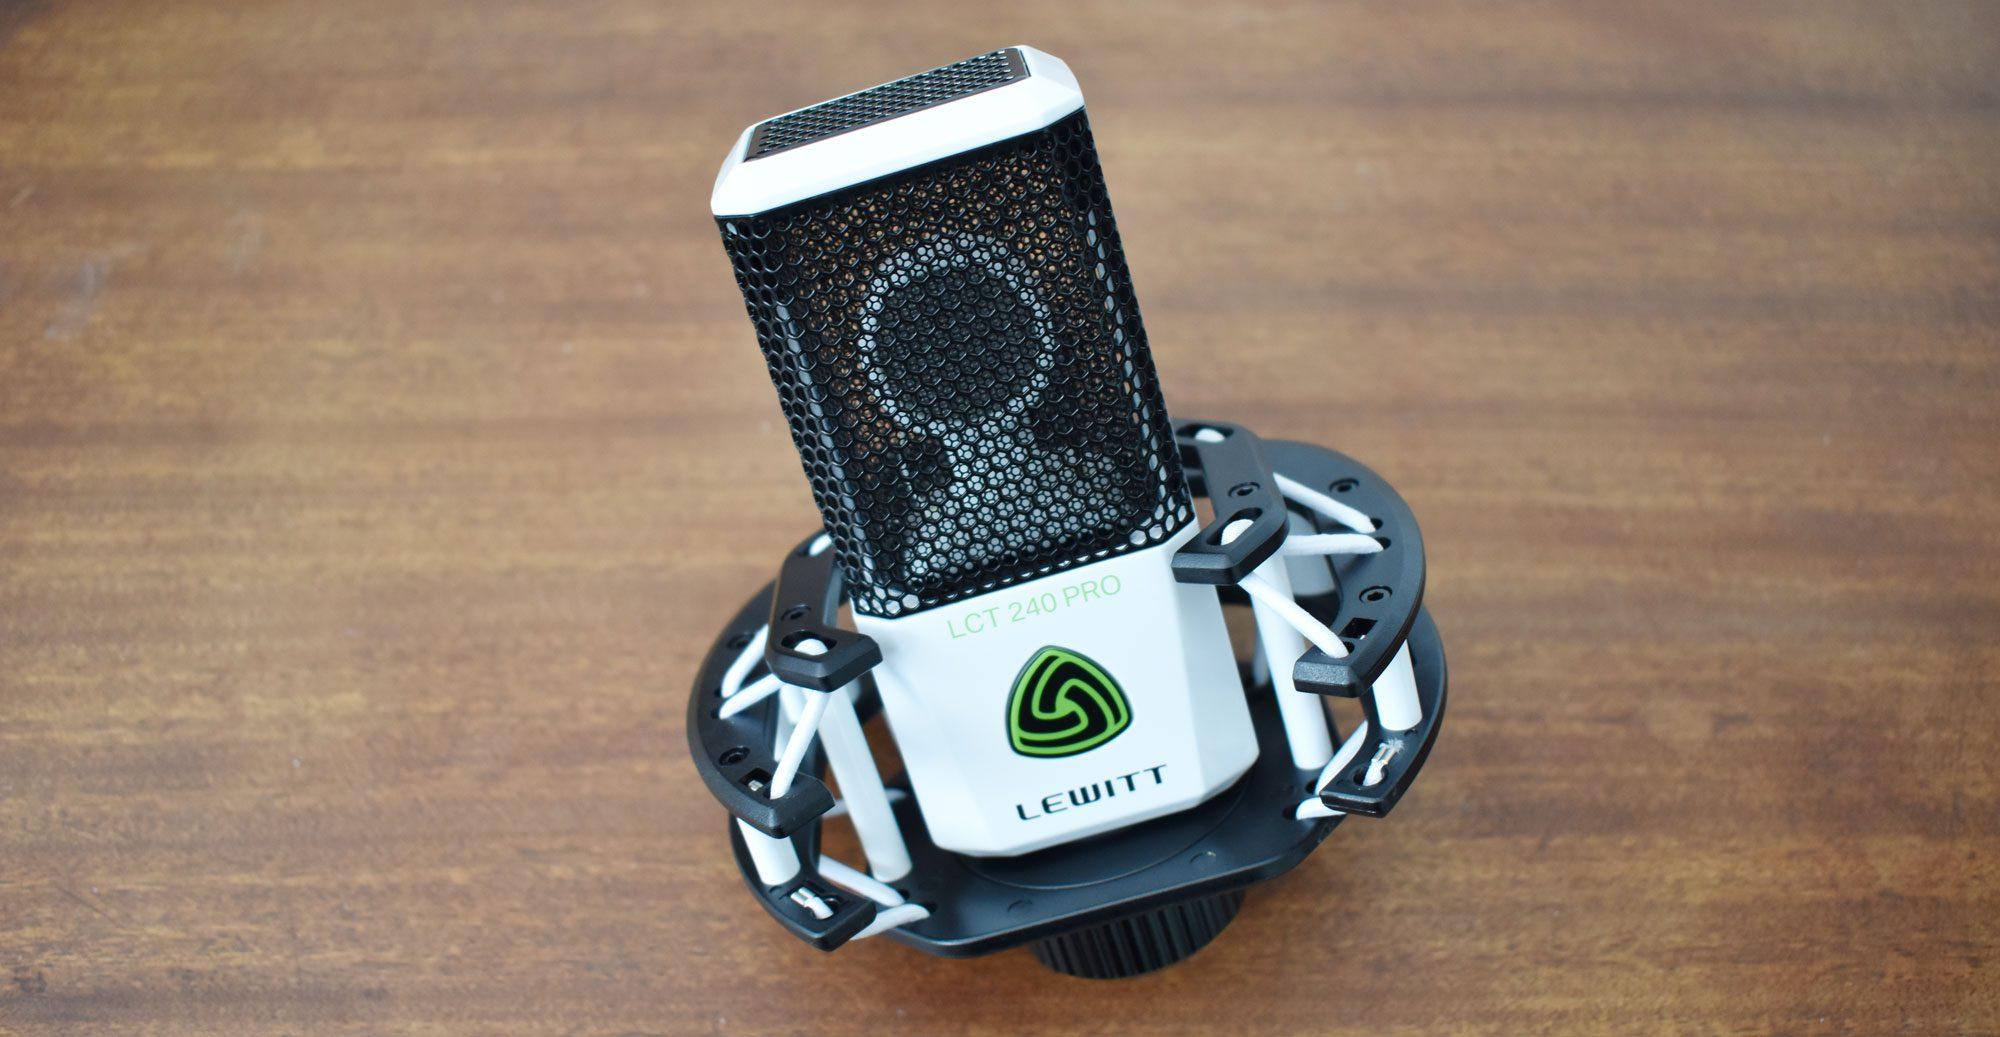 Test: Lewitt LCT240 Pro, Kondensatormikrofon - AMAZONA.de